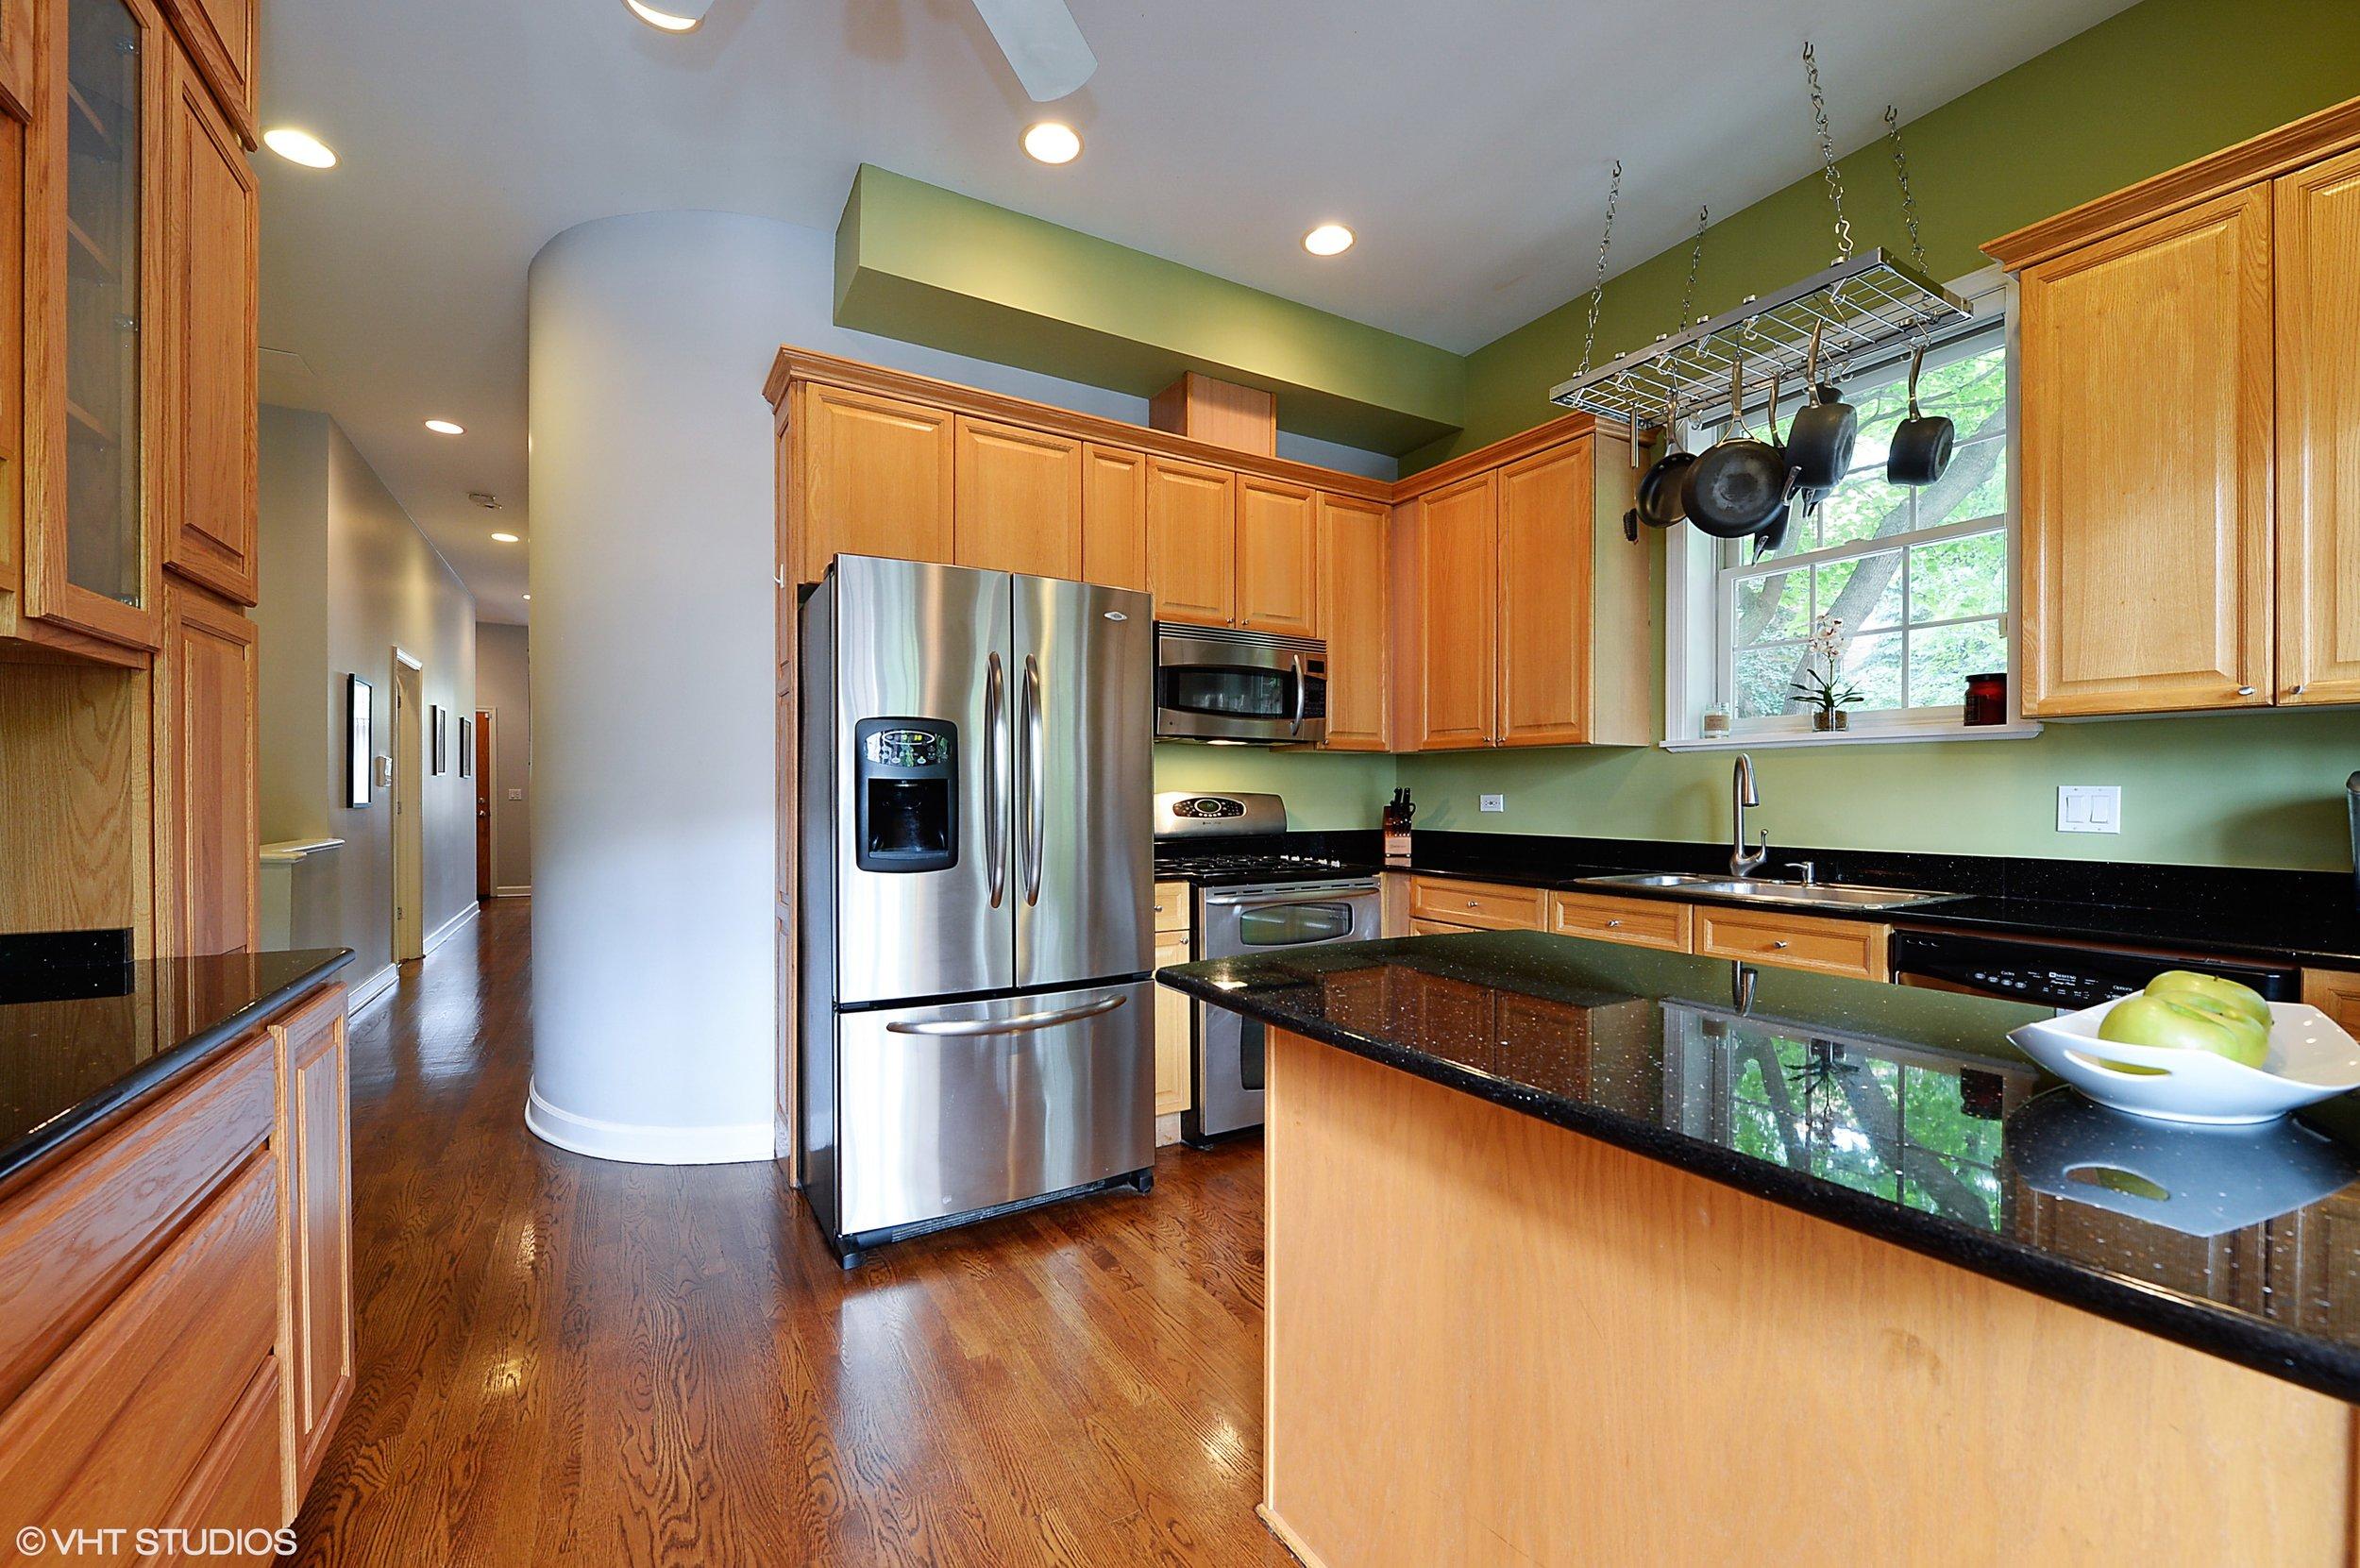 05_1901WestArmitageAve_1E_177_Kitchen_HiRes.jpg